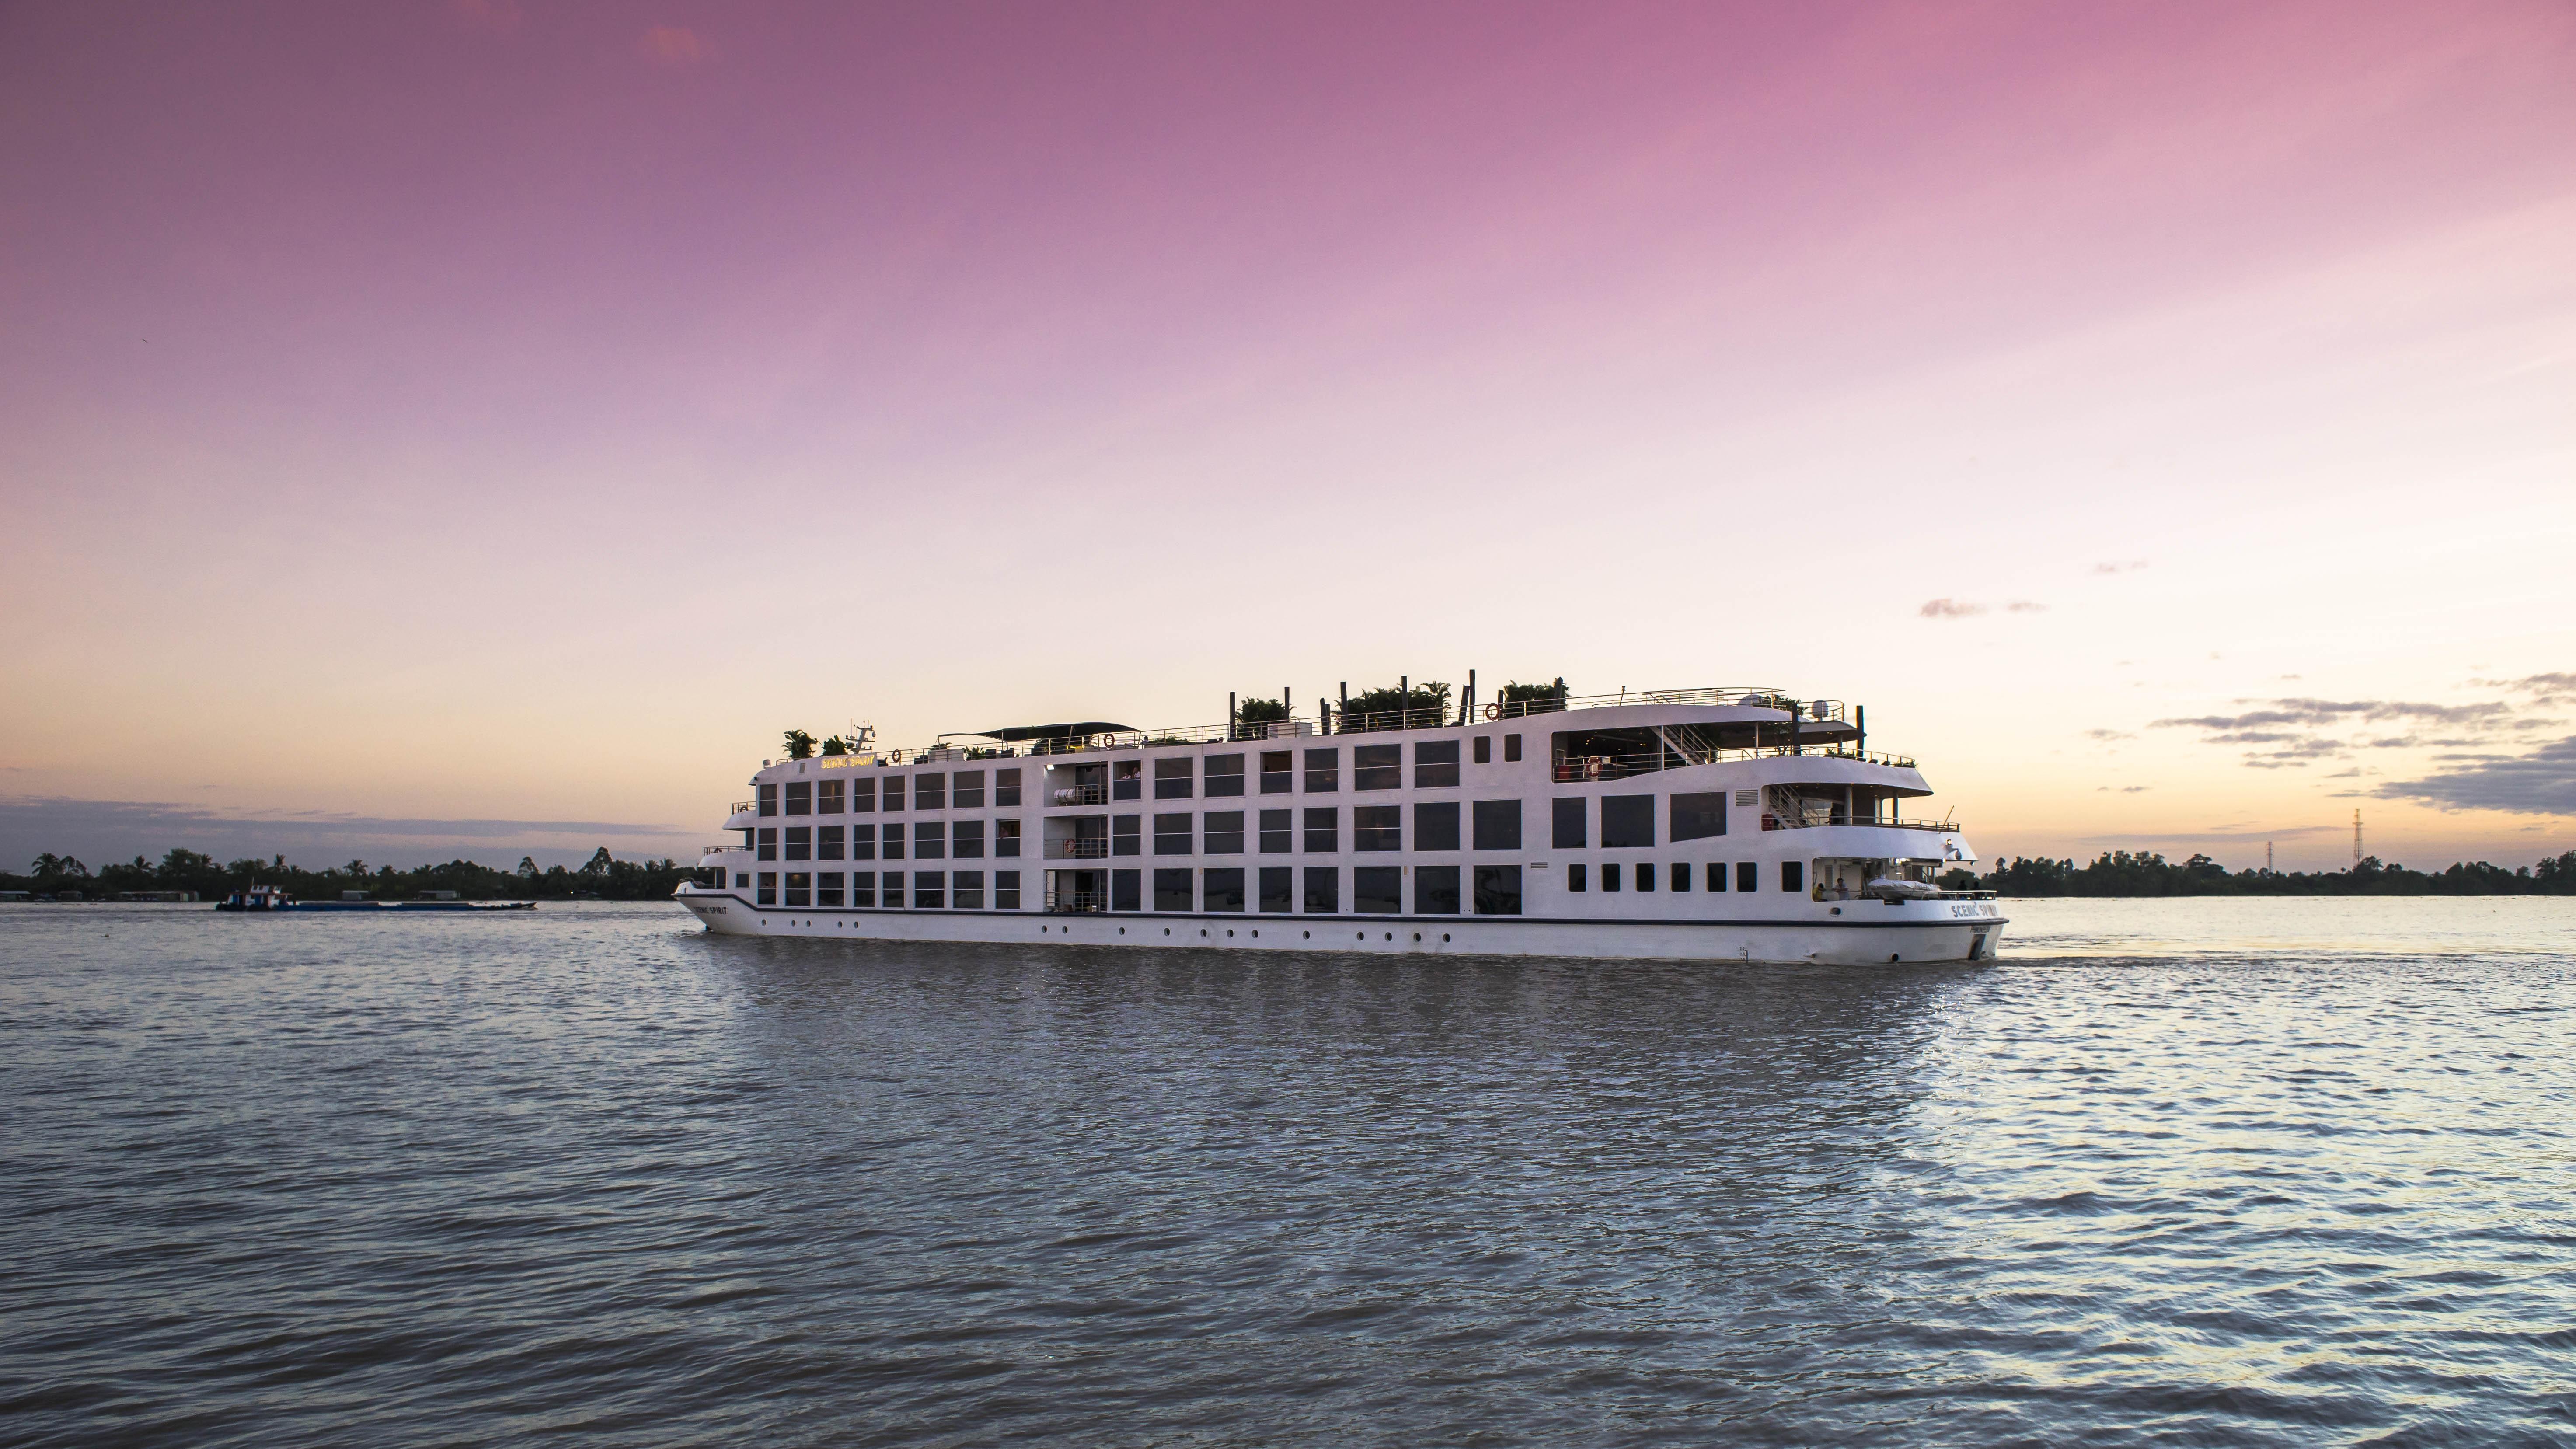 Scenic Cruises Ship Scenic Spirit Scenic Spirit Deals